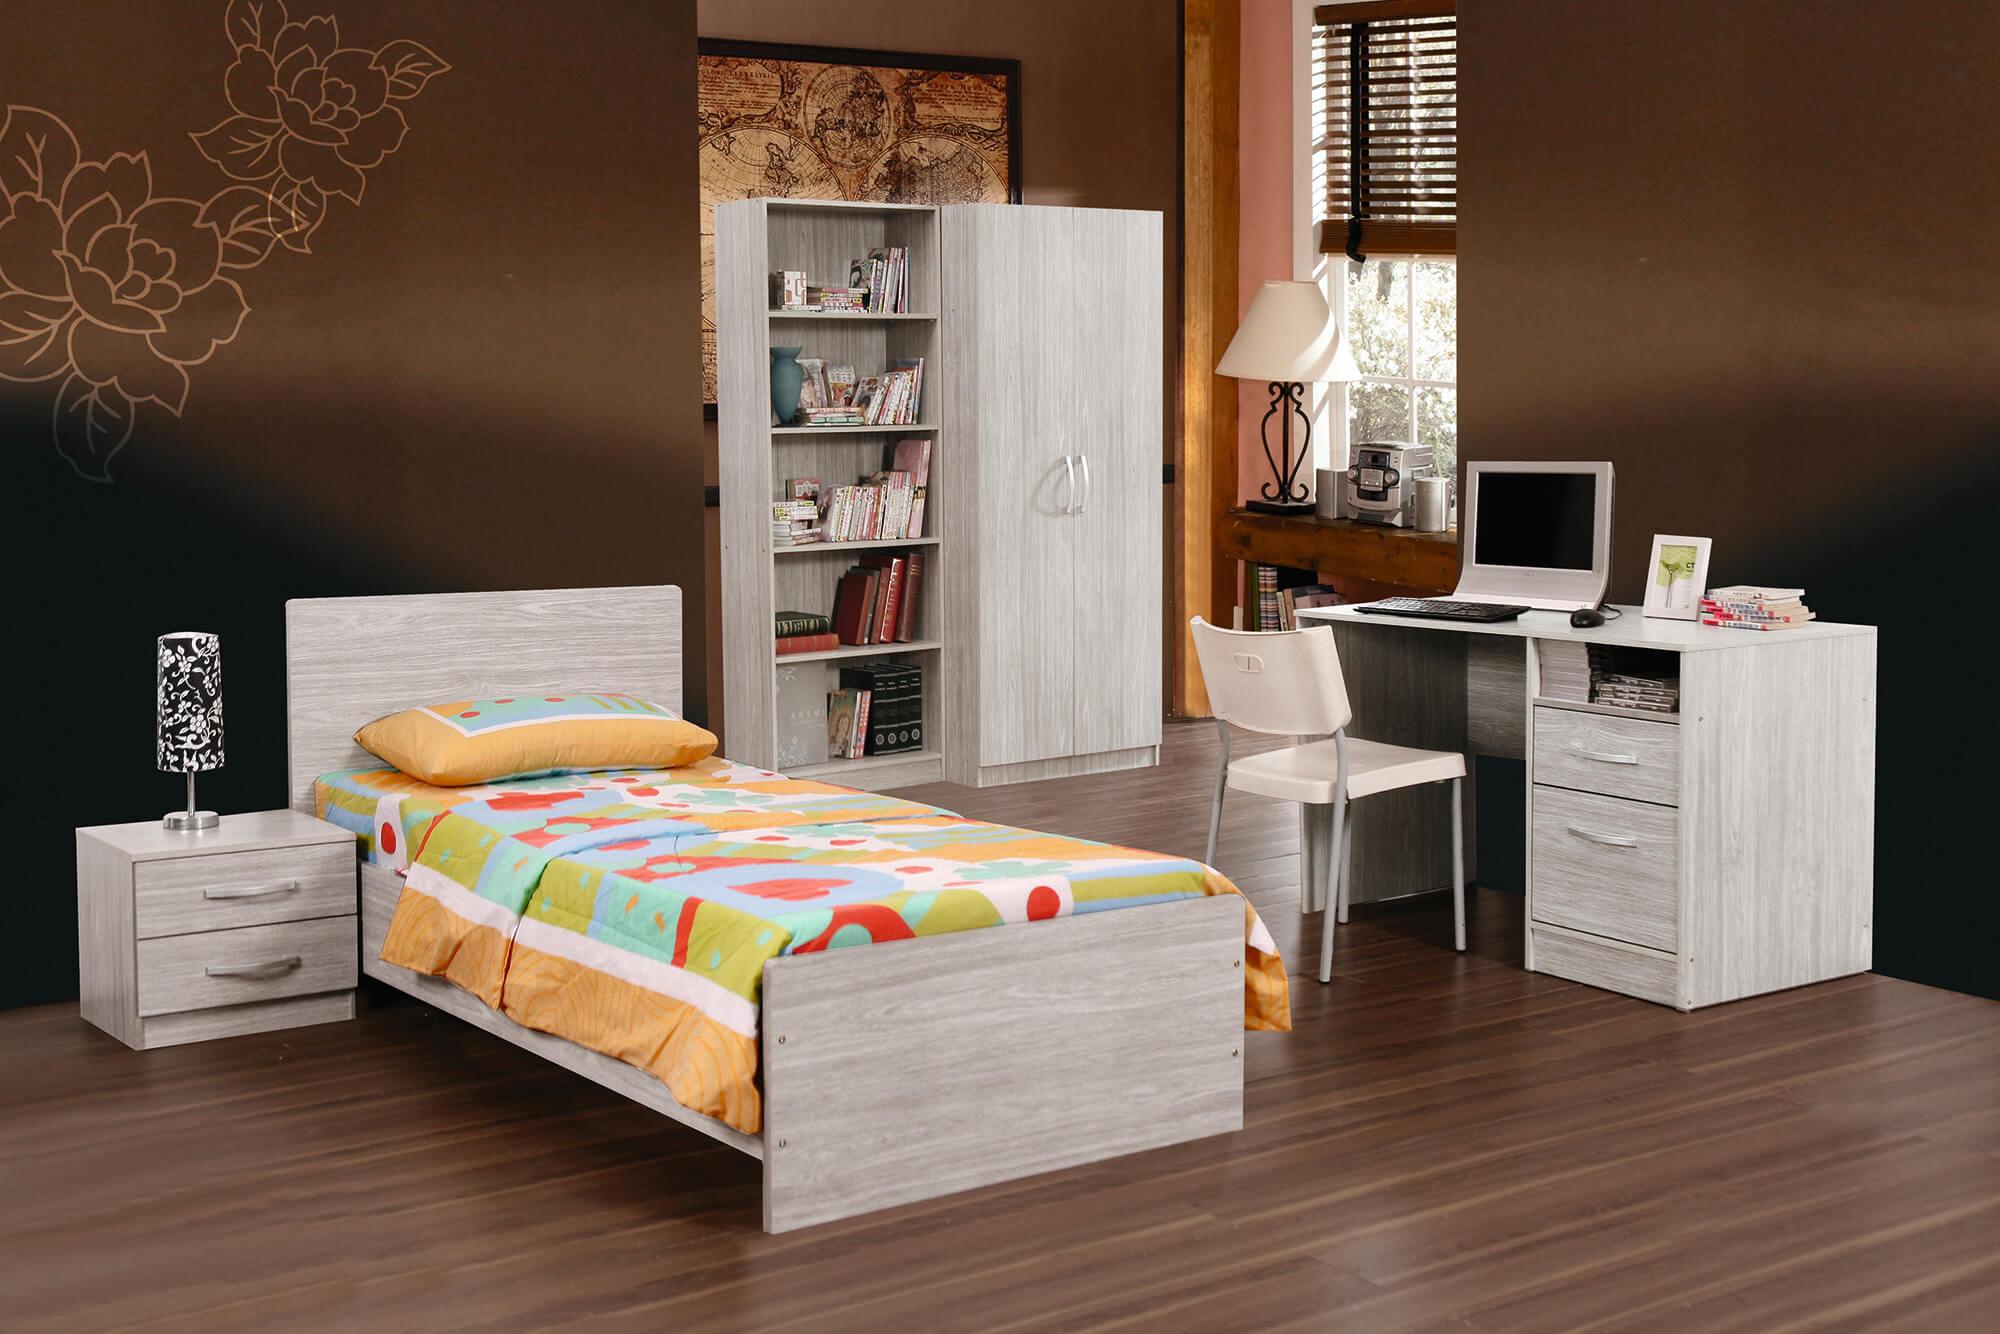 Jeugdslaapkamer Camila, bed 90x200 + nachttafel + kledingkast 80 cm